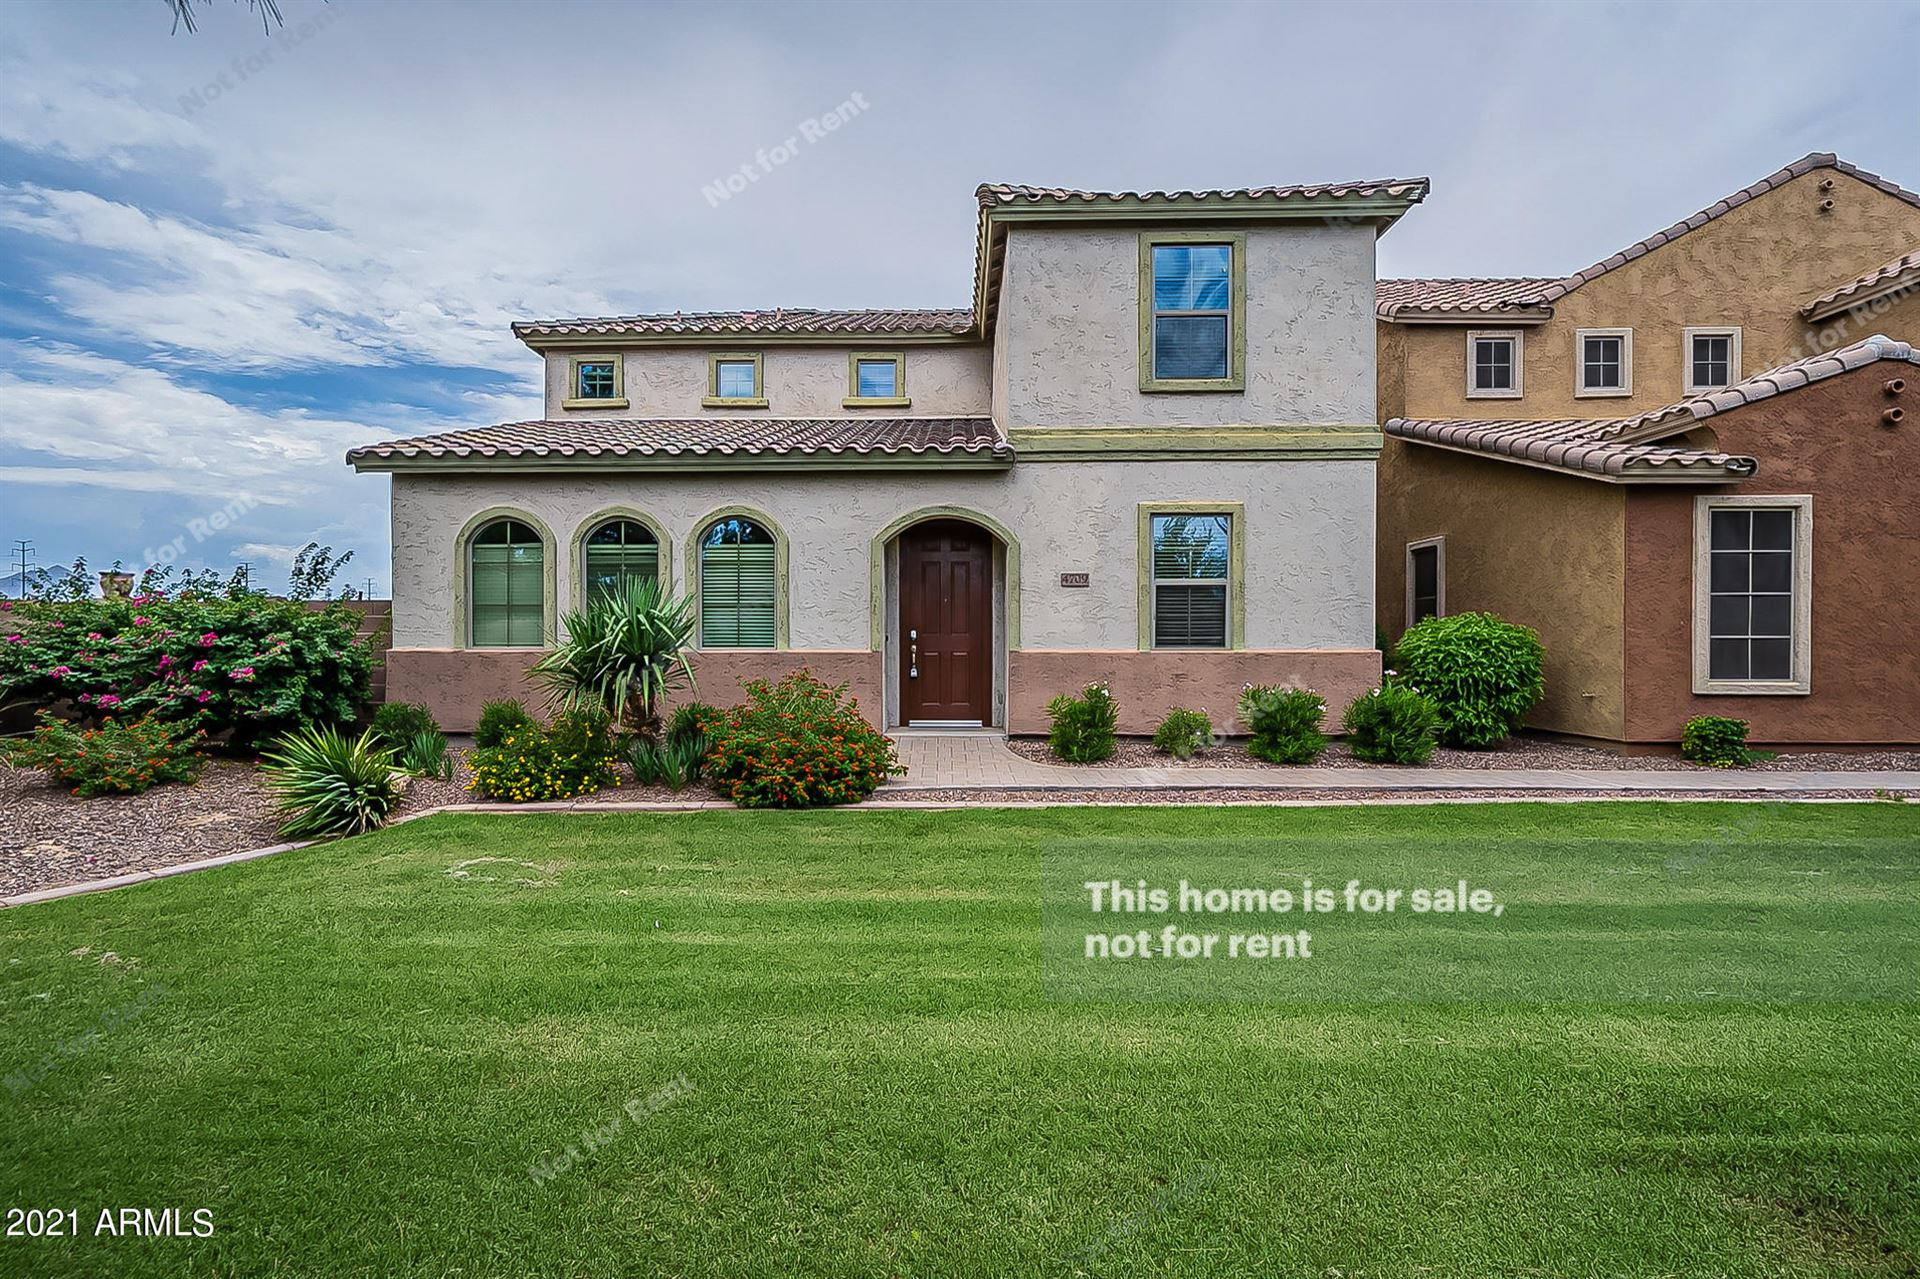 Photo of 4709 W FREMONT Road, Laveen, AZ 85339 (MLS # 6272131)